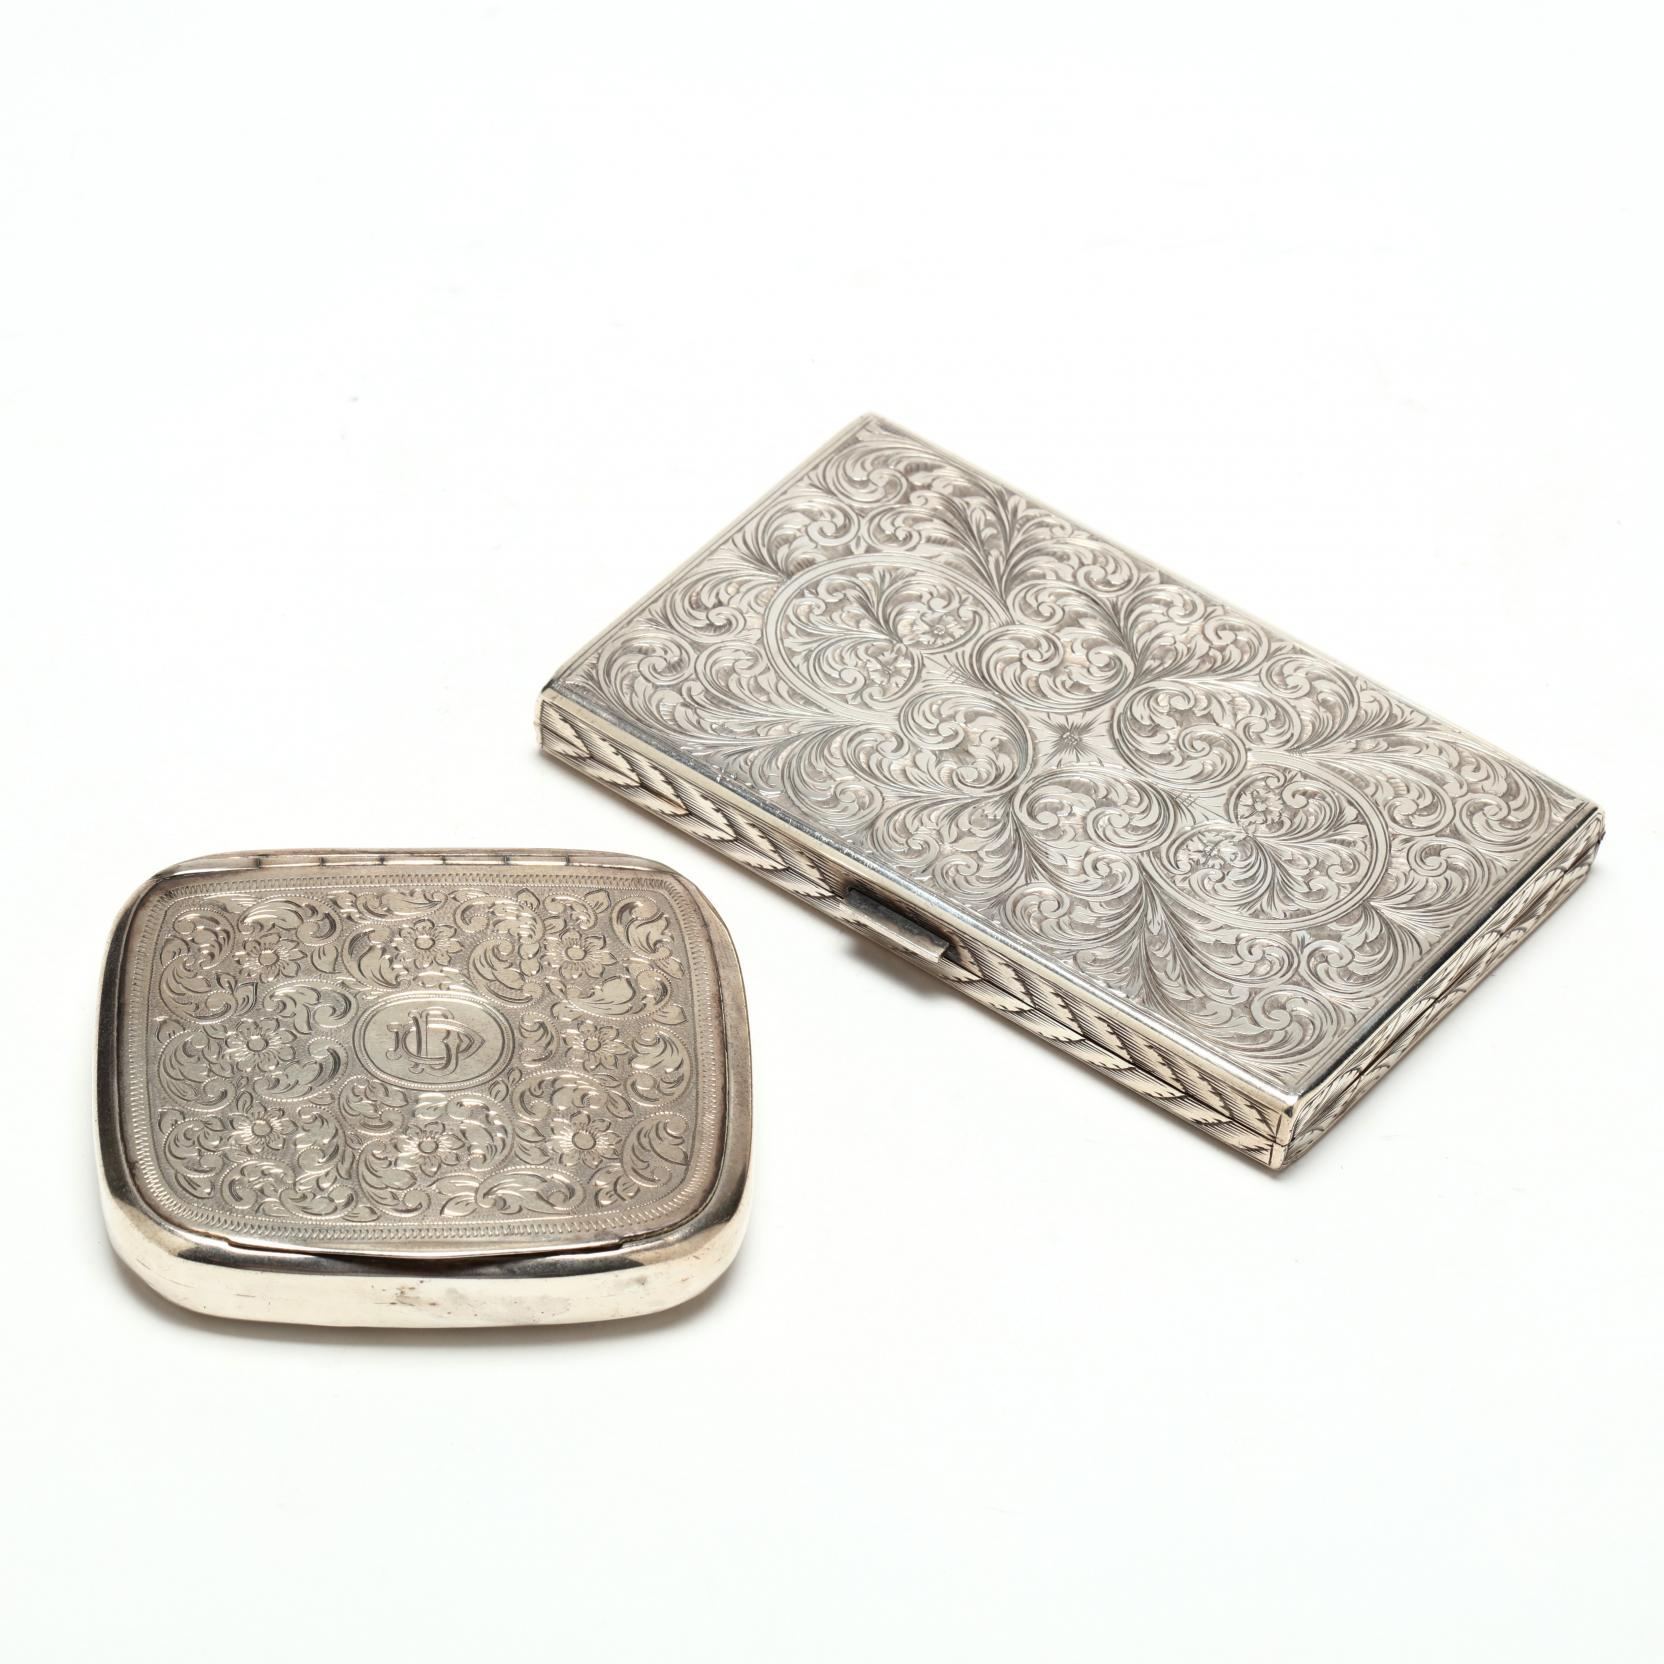 two-continental-800-silver-cigarette-cases